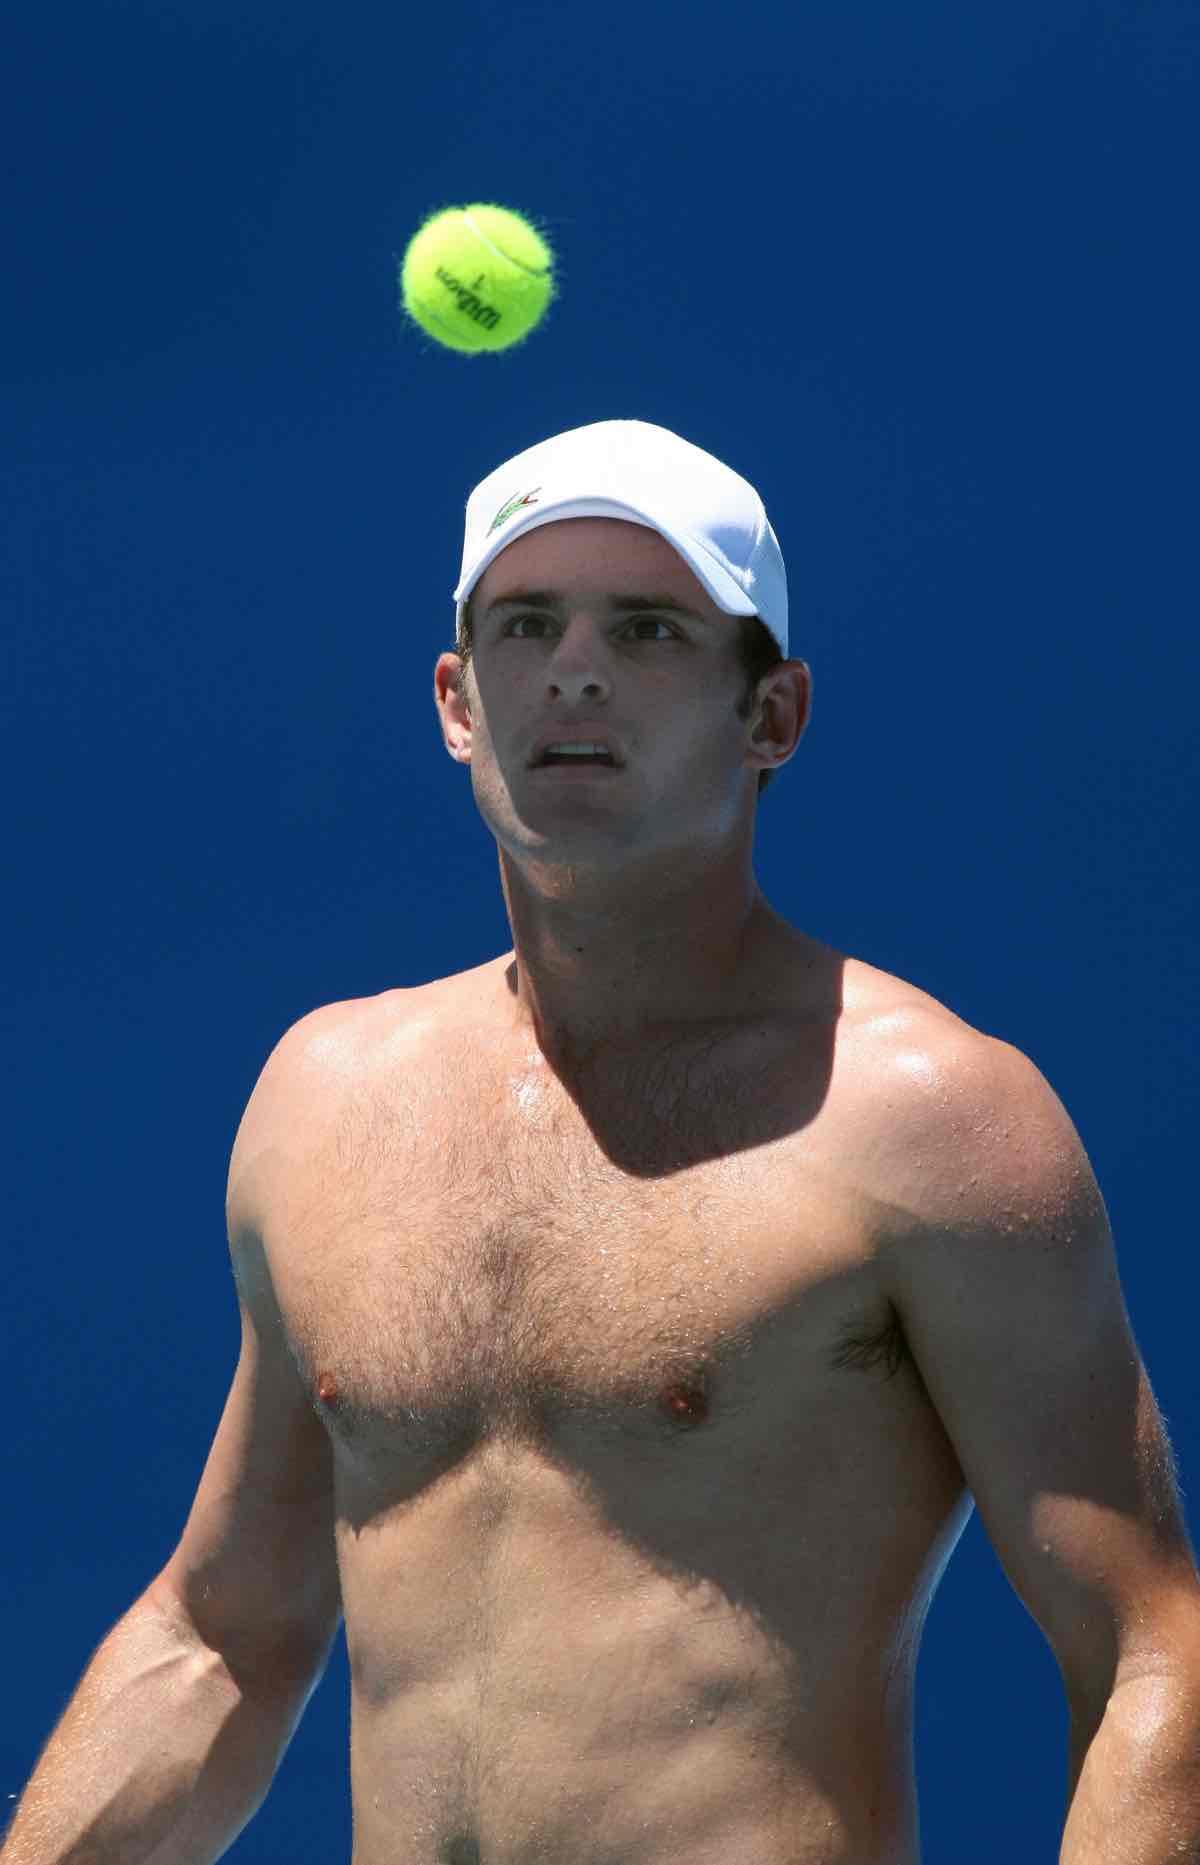 Andy Roddick of the US smashes the felt